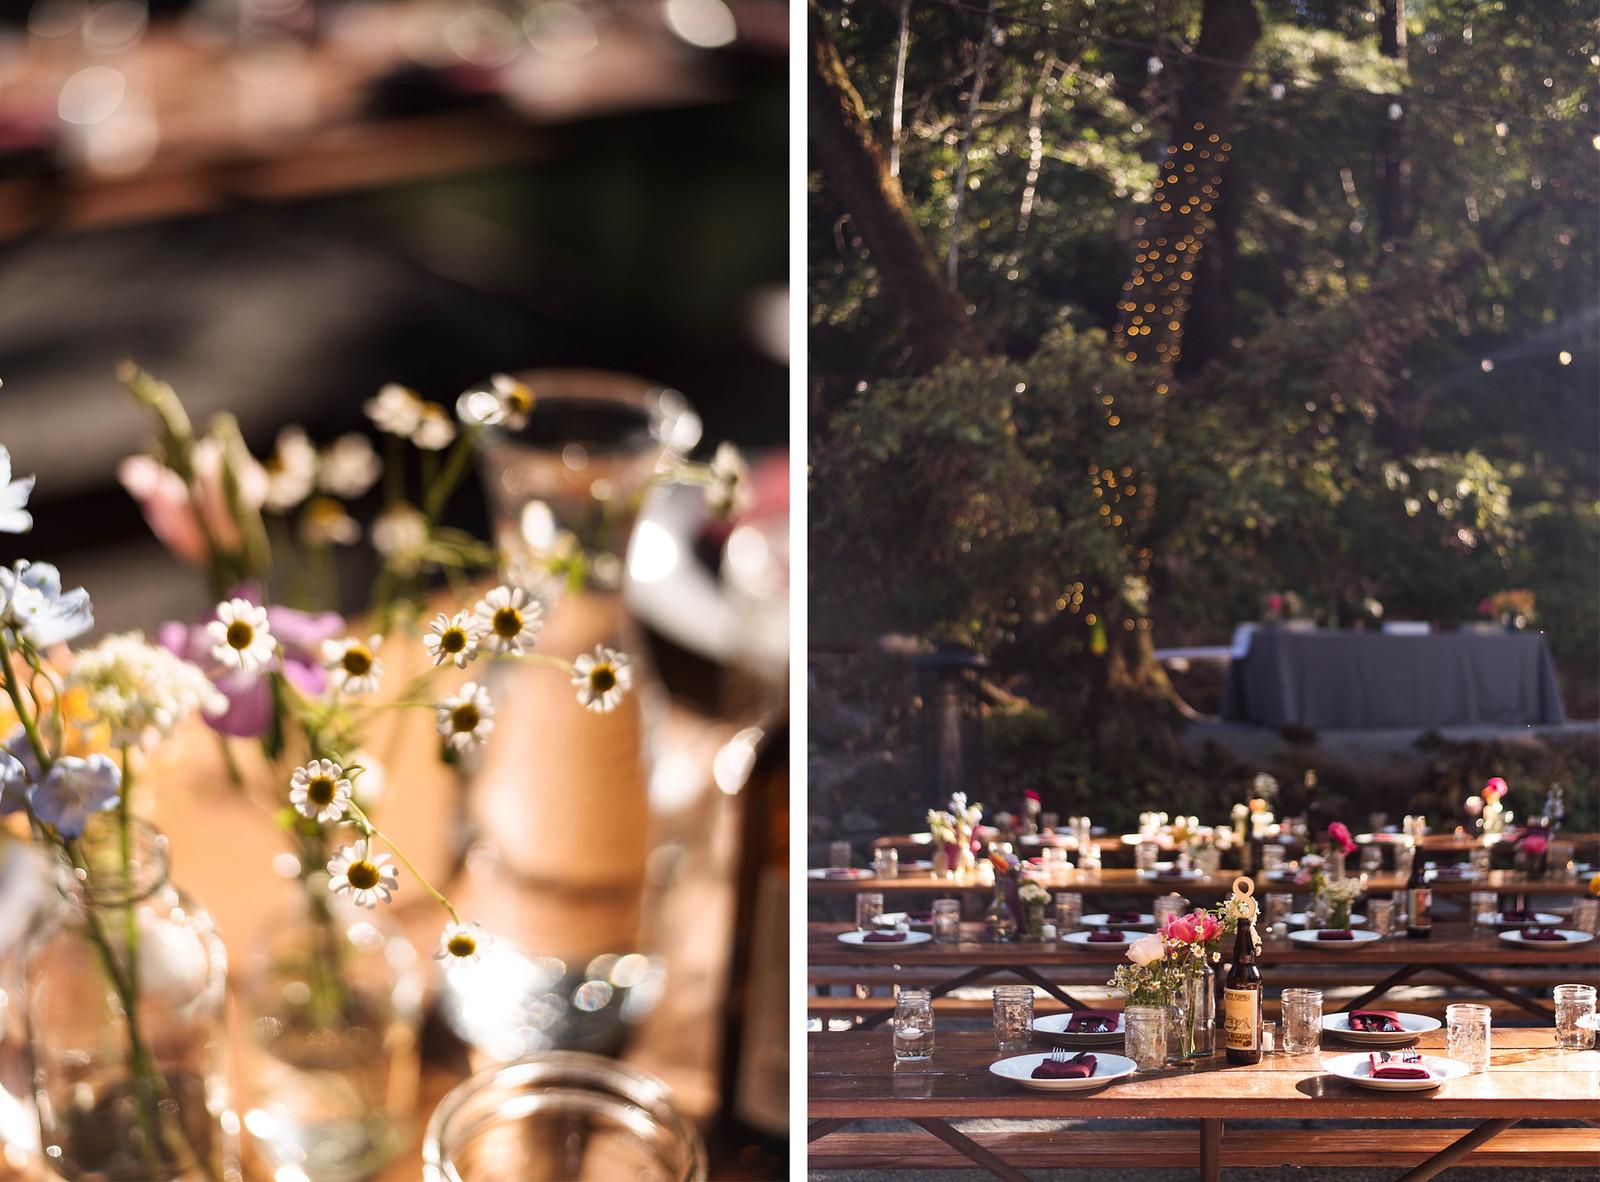 saratoga-springs-wedding-california-photographer on juliettelaura.com